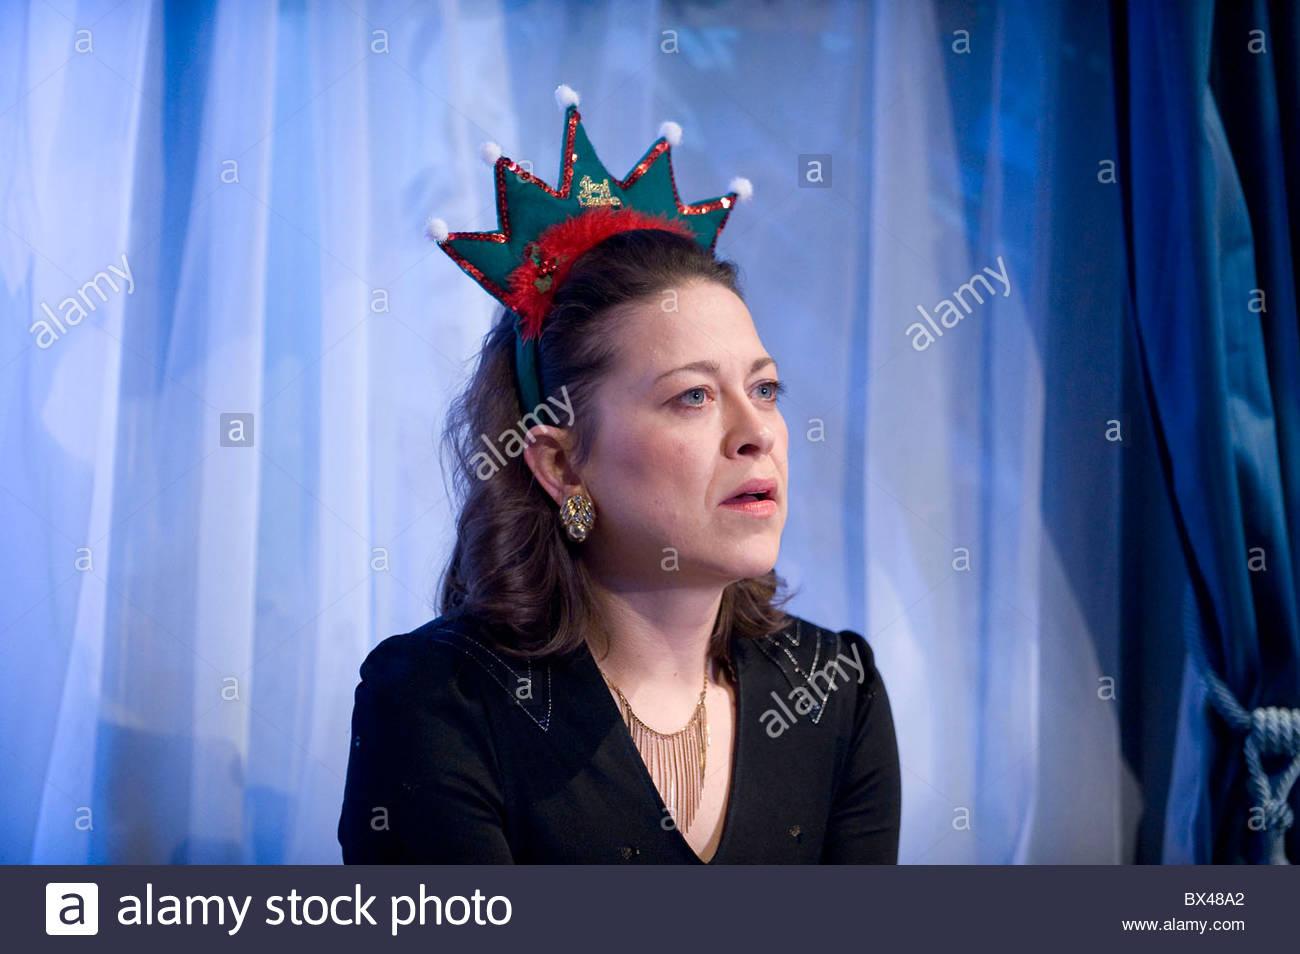 Season's Greetings by Alan Ayckbourn,directed by Marianne Elliott. With Katherine Parkinson as Pattie,Catherine - Stock Image